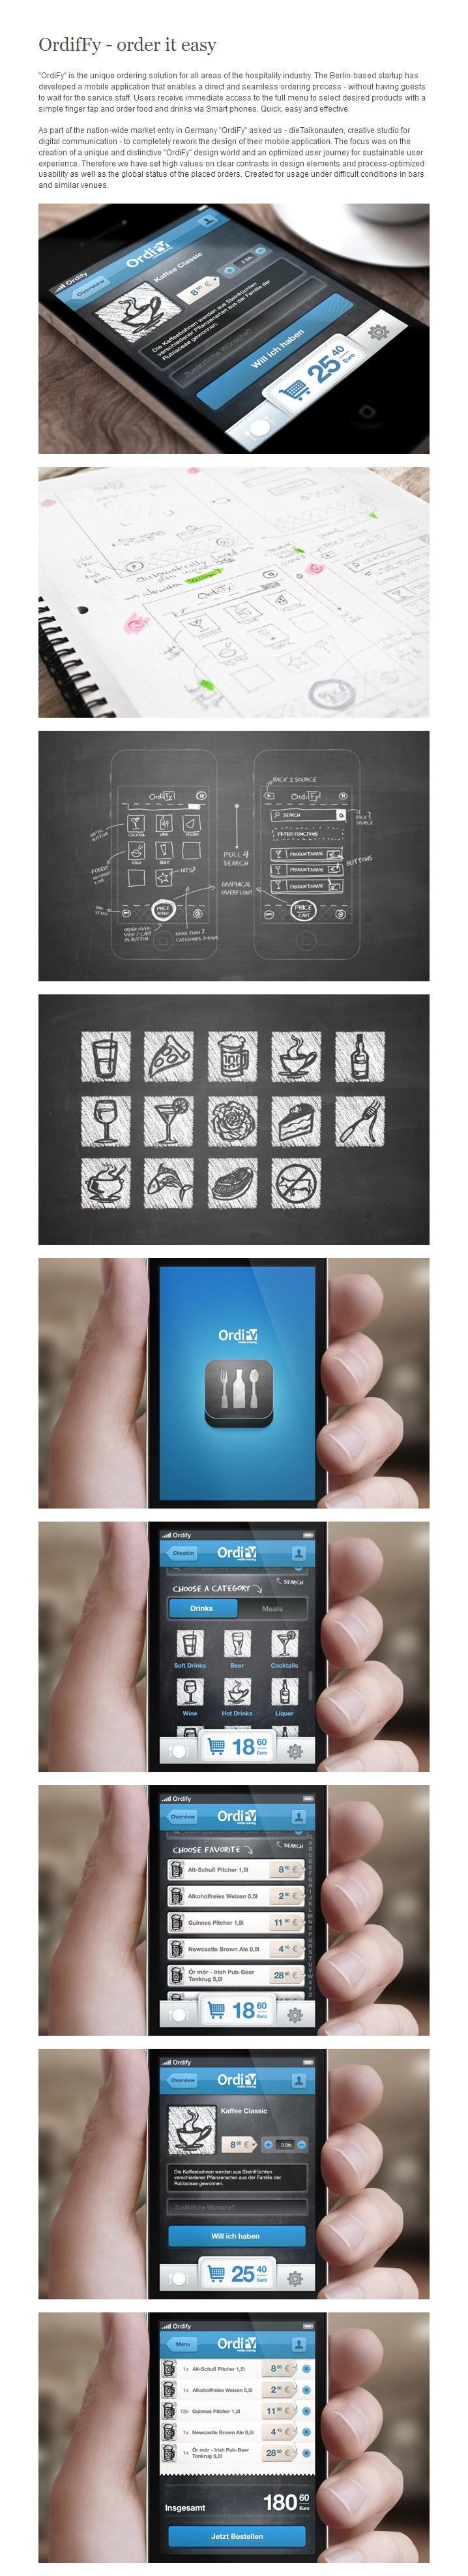 #mobile #digital #ui #app